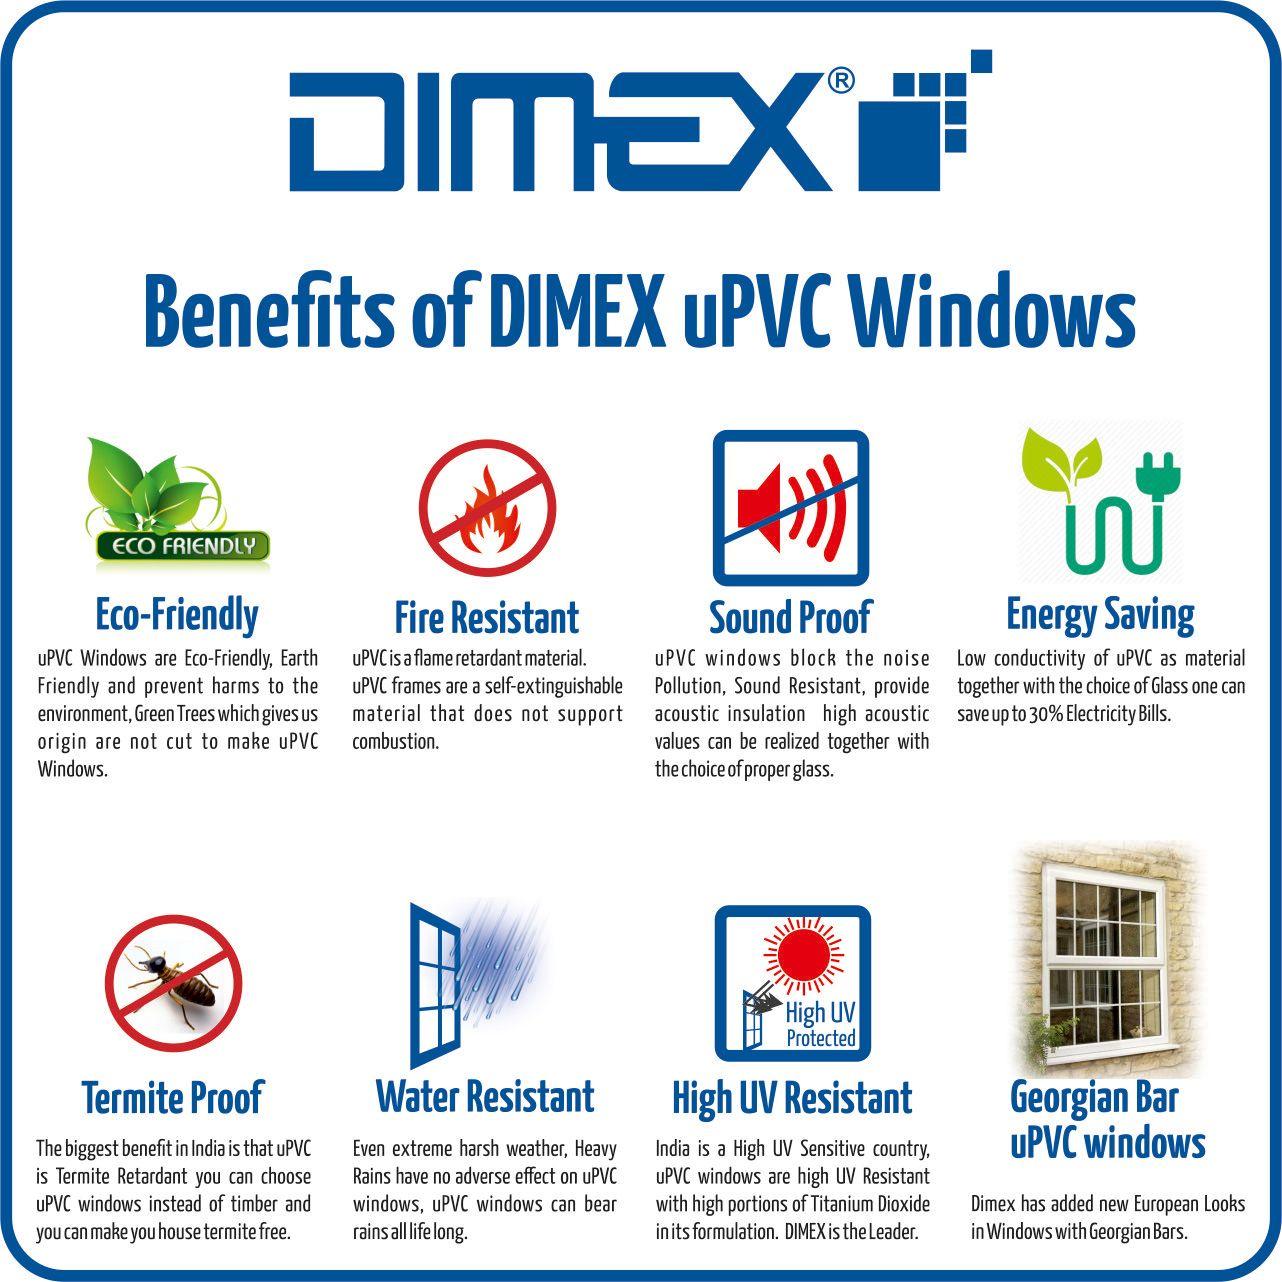 The Benefits of DIMEX uPVC Windows EcoFriendly